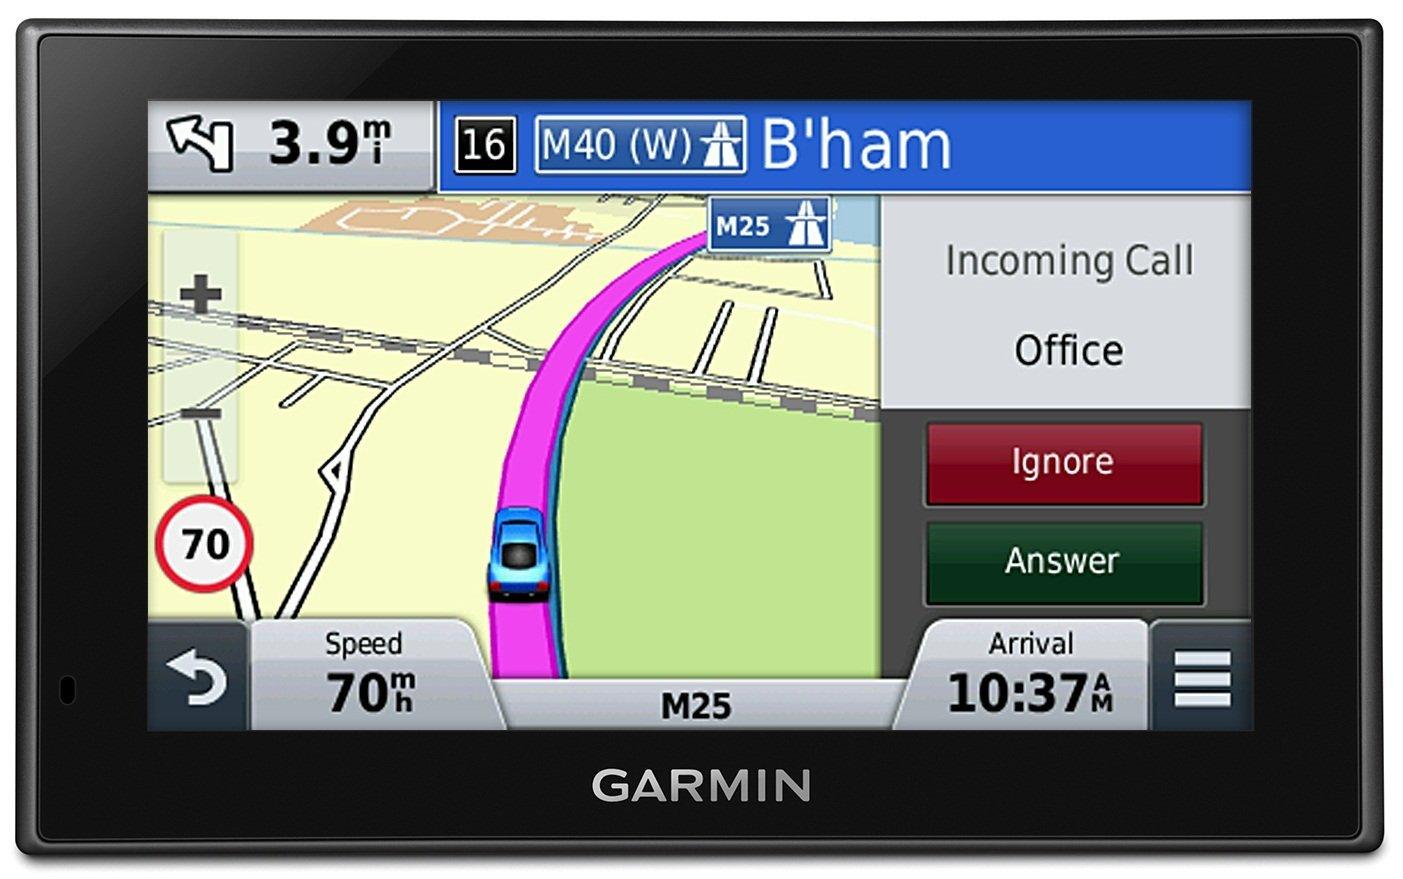 Garmin Nuvi LMT GPS SATNAV North America USA Canada UK Europe - Sat nav with usa and europe maps